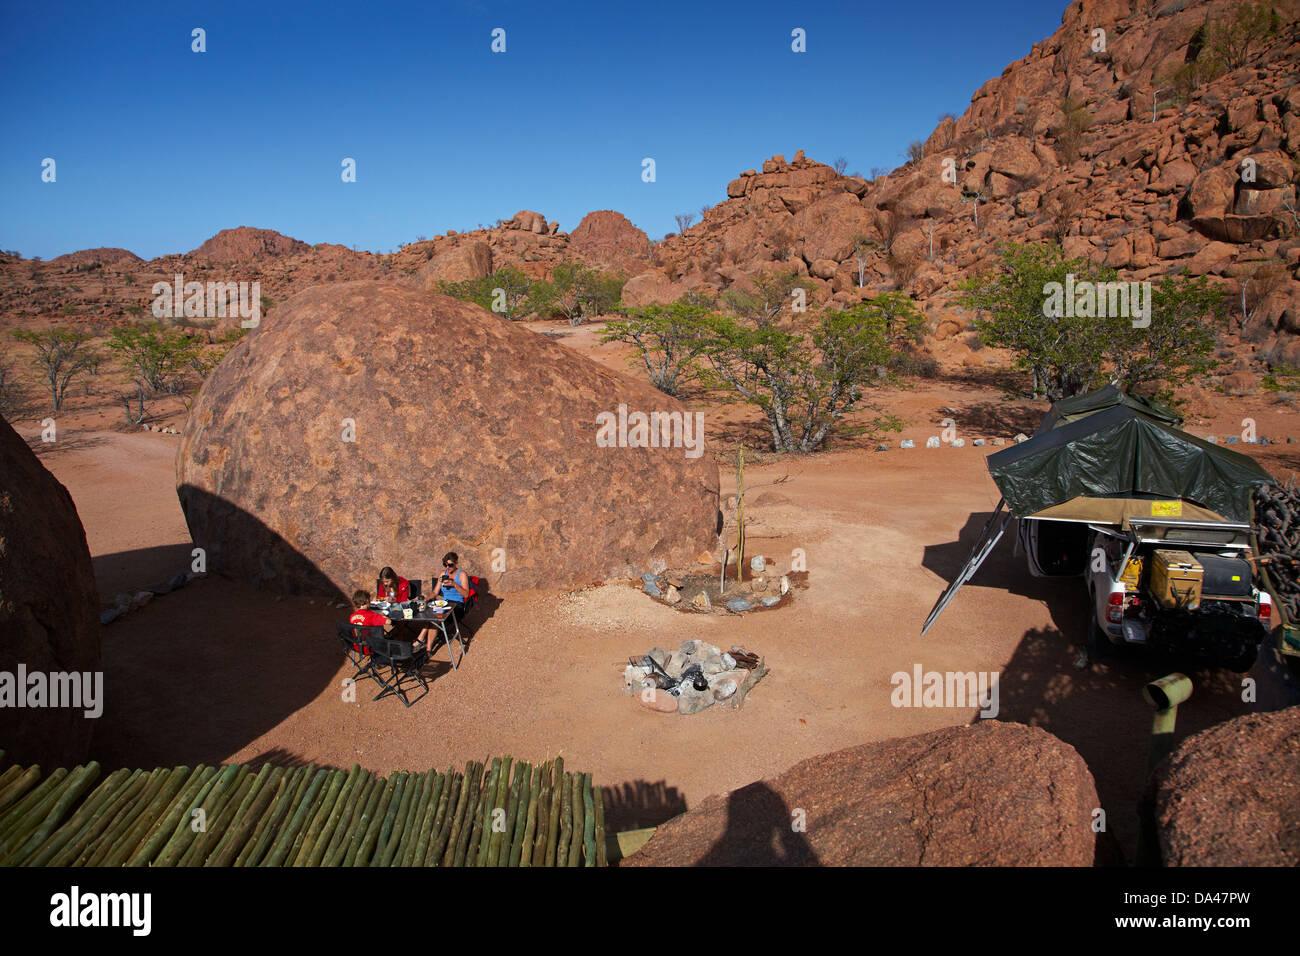 Family camping at Mowani Mountain Camp, near Twyfelfontein, Damaraland, Namibia, Africa - Stock Image